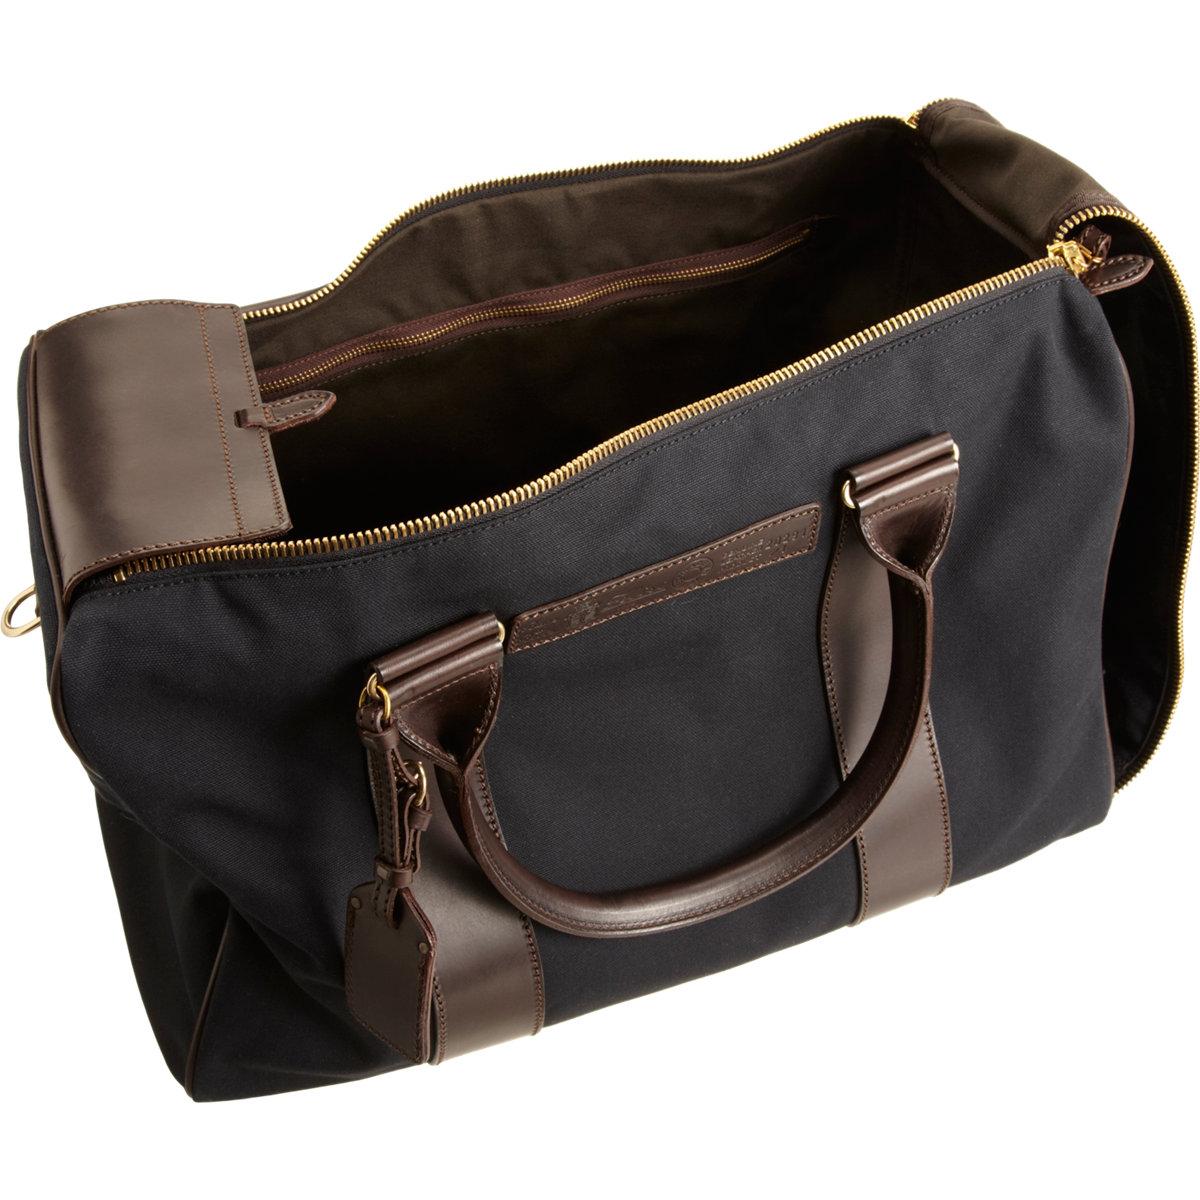 19e6168bd815 Felisi Leather Trimmed Duffel in Black for Men - Lyst